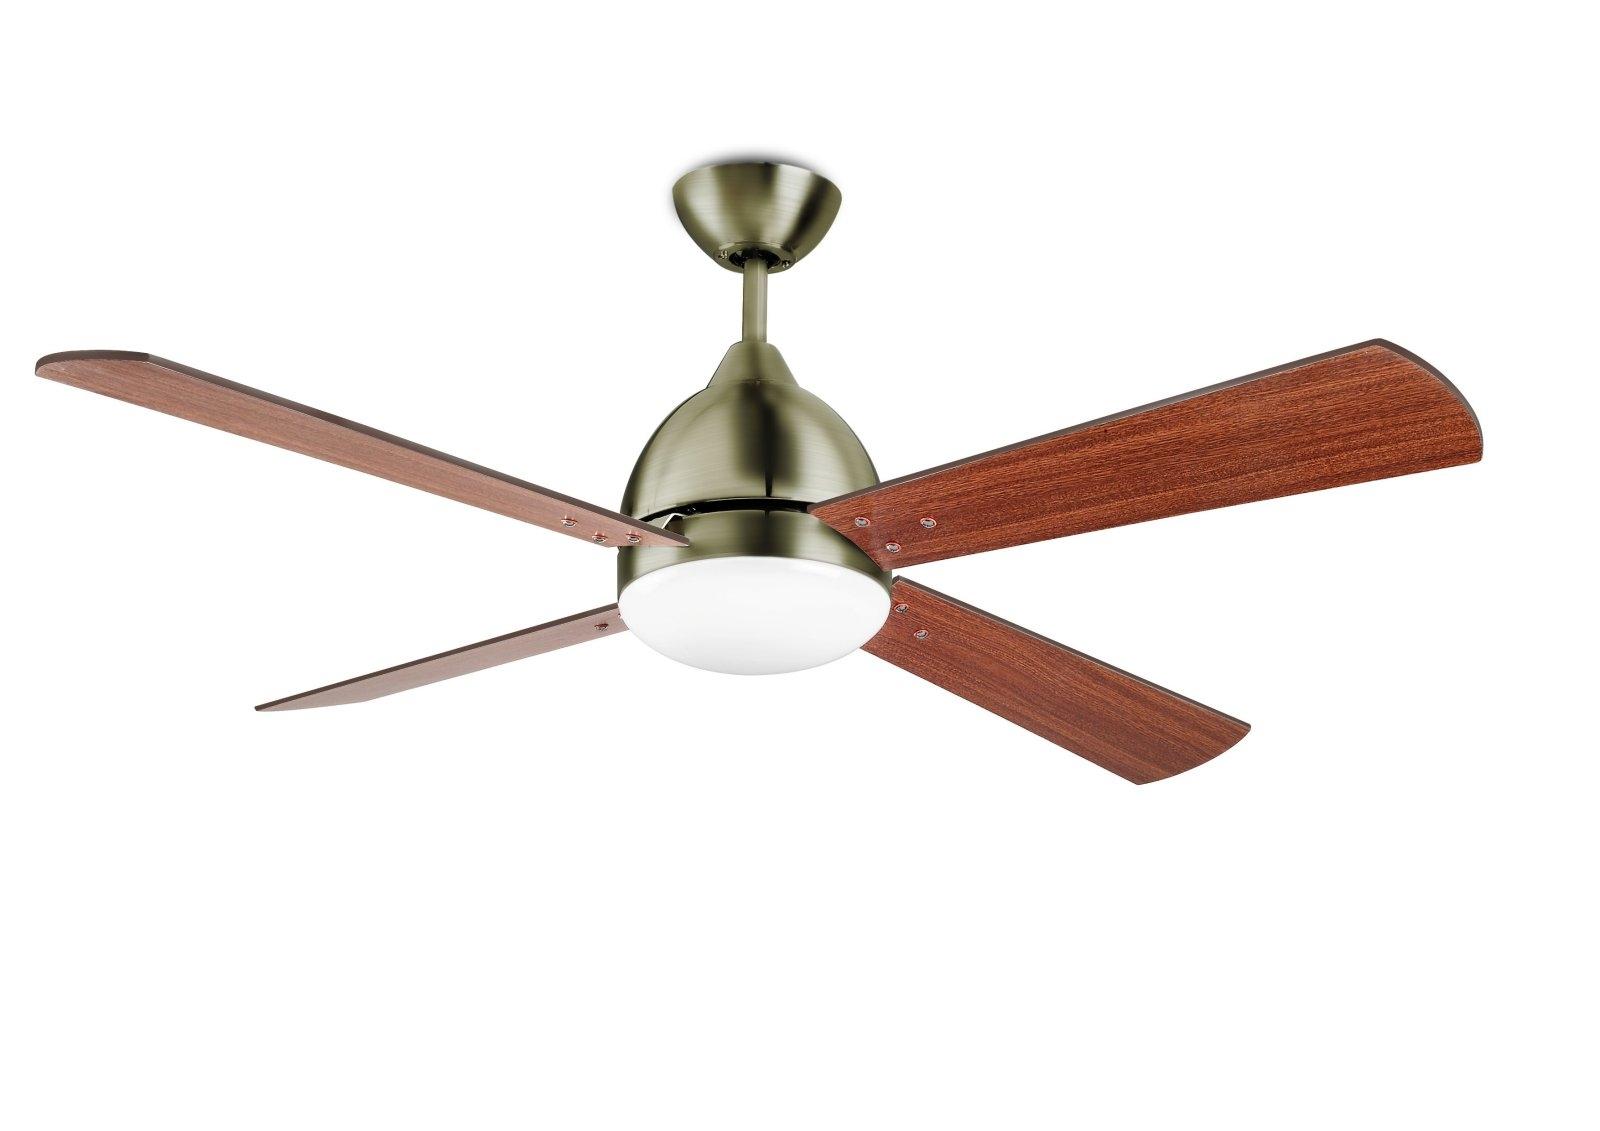 Large Ceiling Fans : Big ceiling fans with lights large fan complete